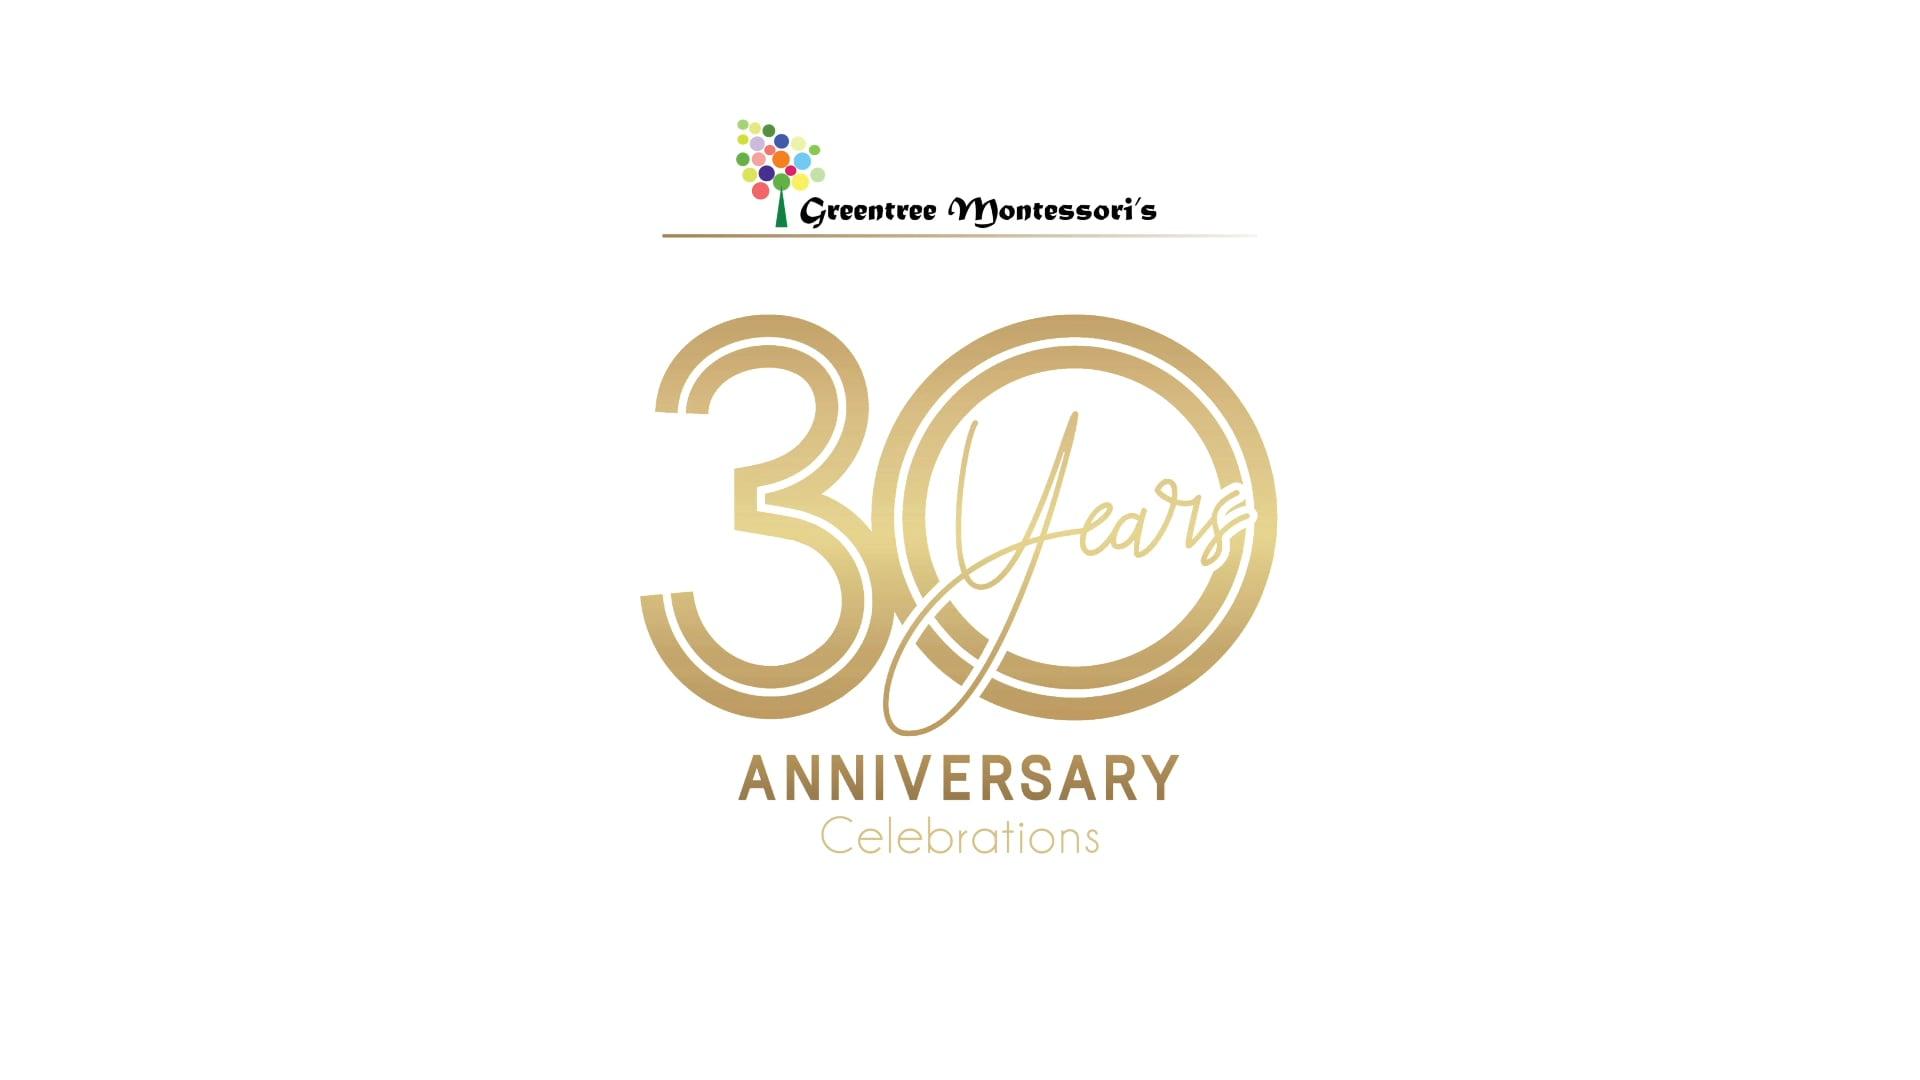 30th Anniversary Alumni Sharing - Soh Boon Ping